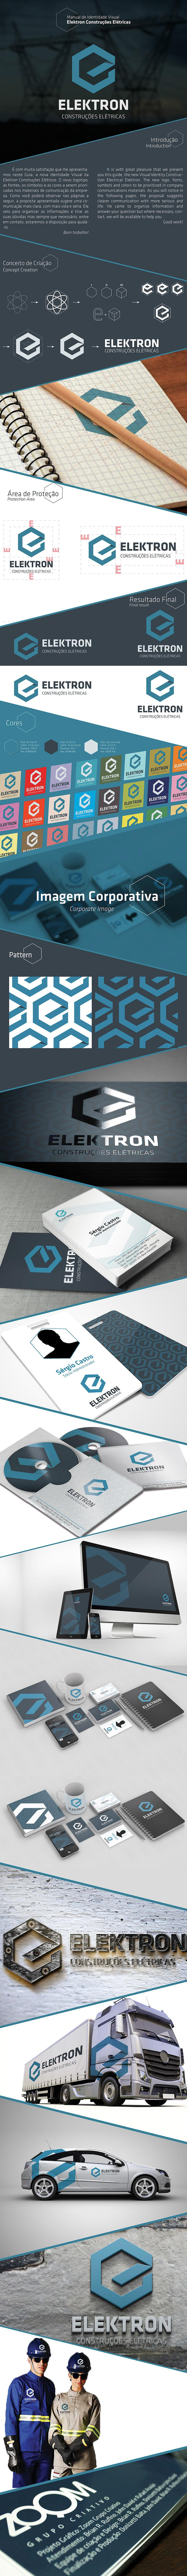 Brand Elektron